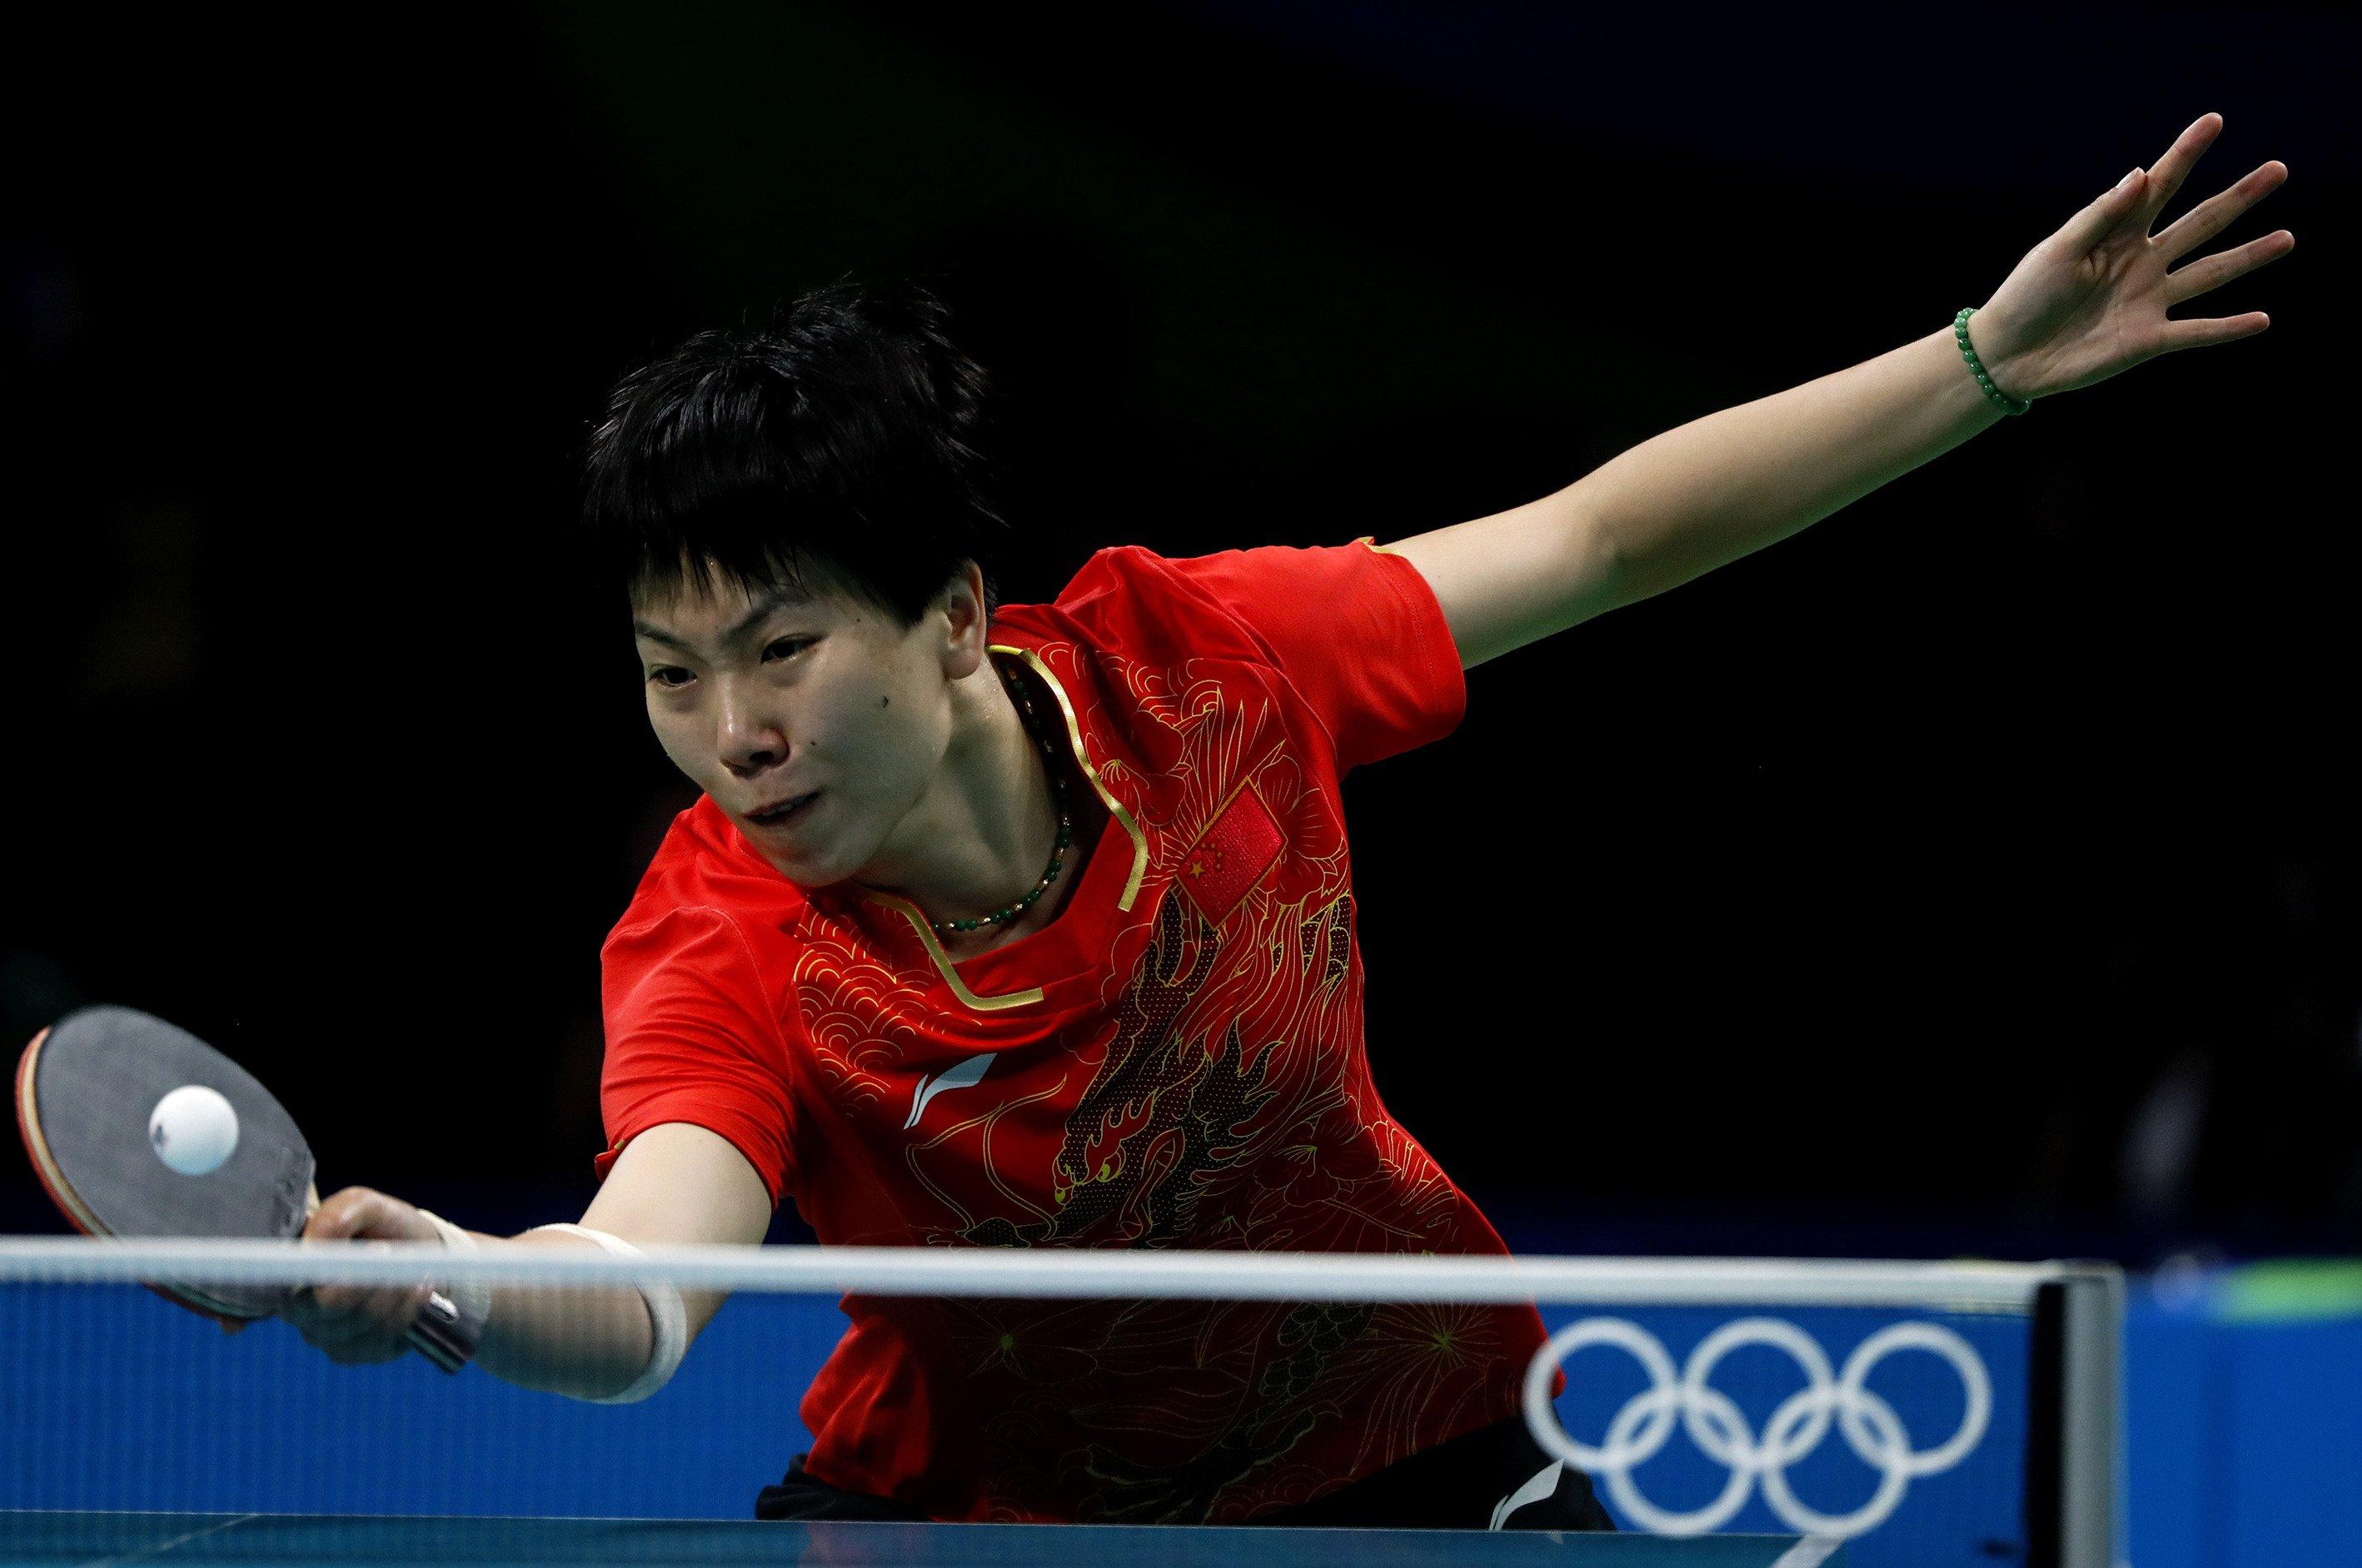 Publican esquema para forjar a China como una poderosa nación deportiva